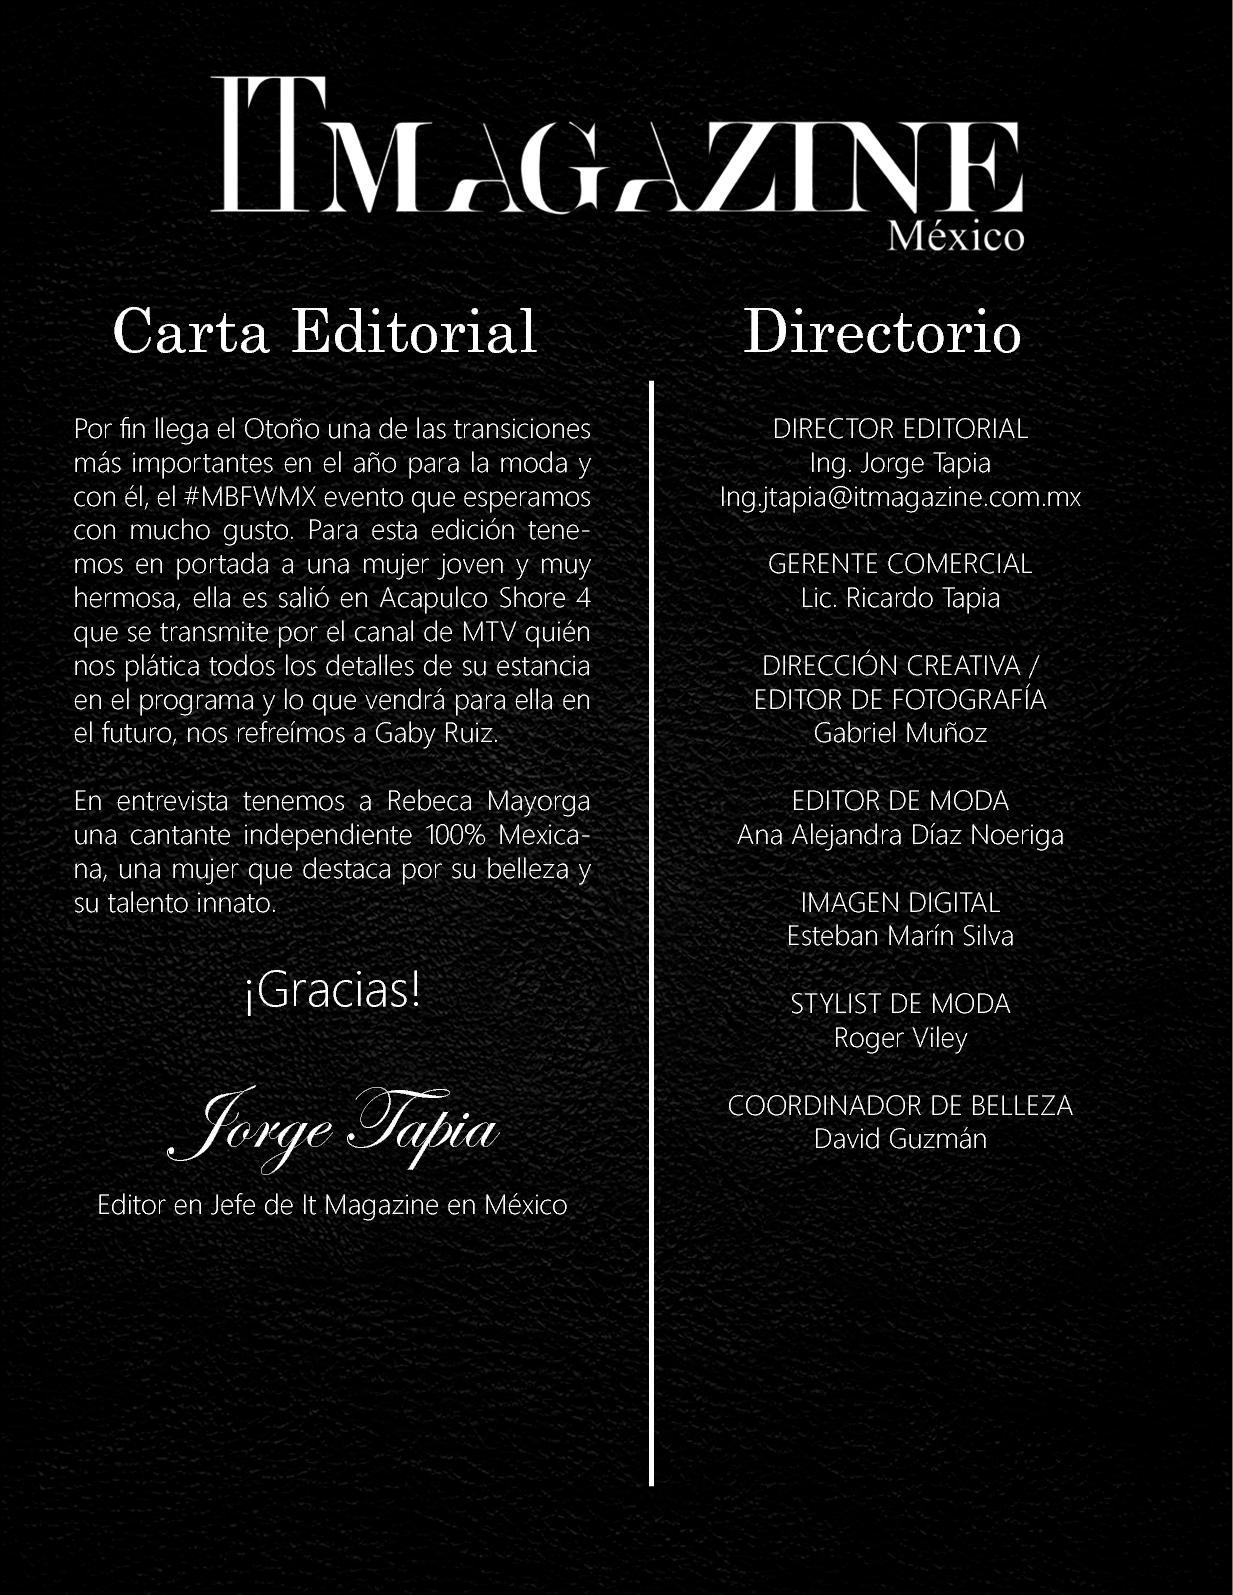 It Magazine Mx Calameo Downloader # Muebles Rangel Guanajuato